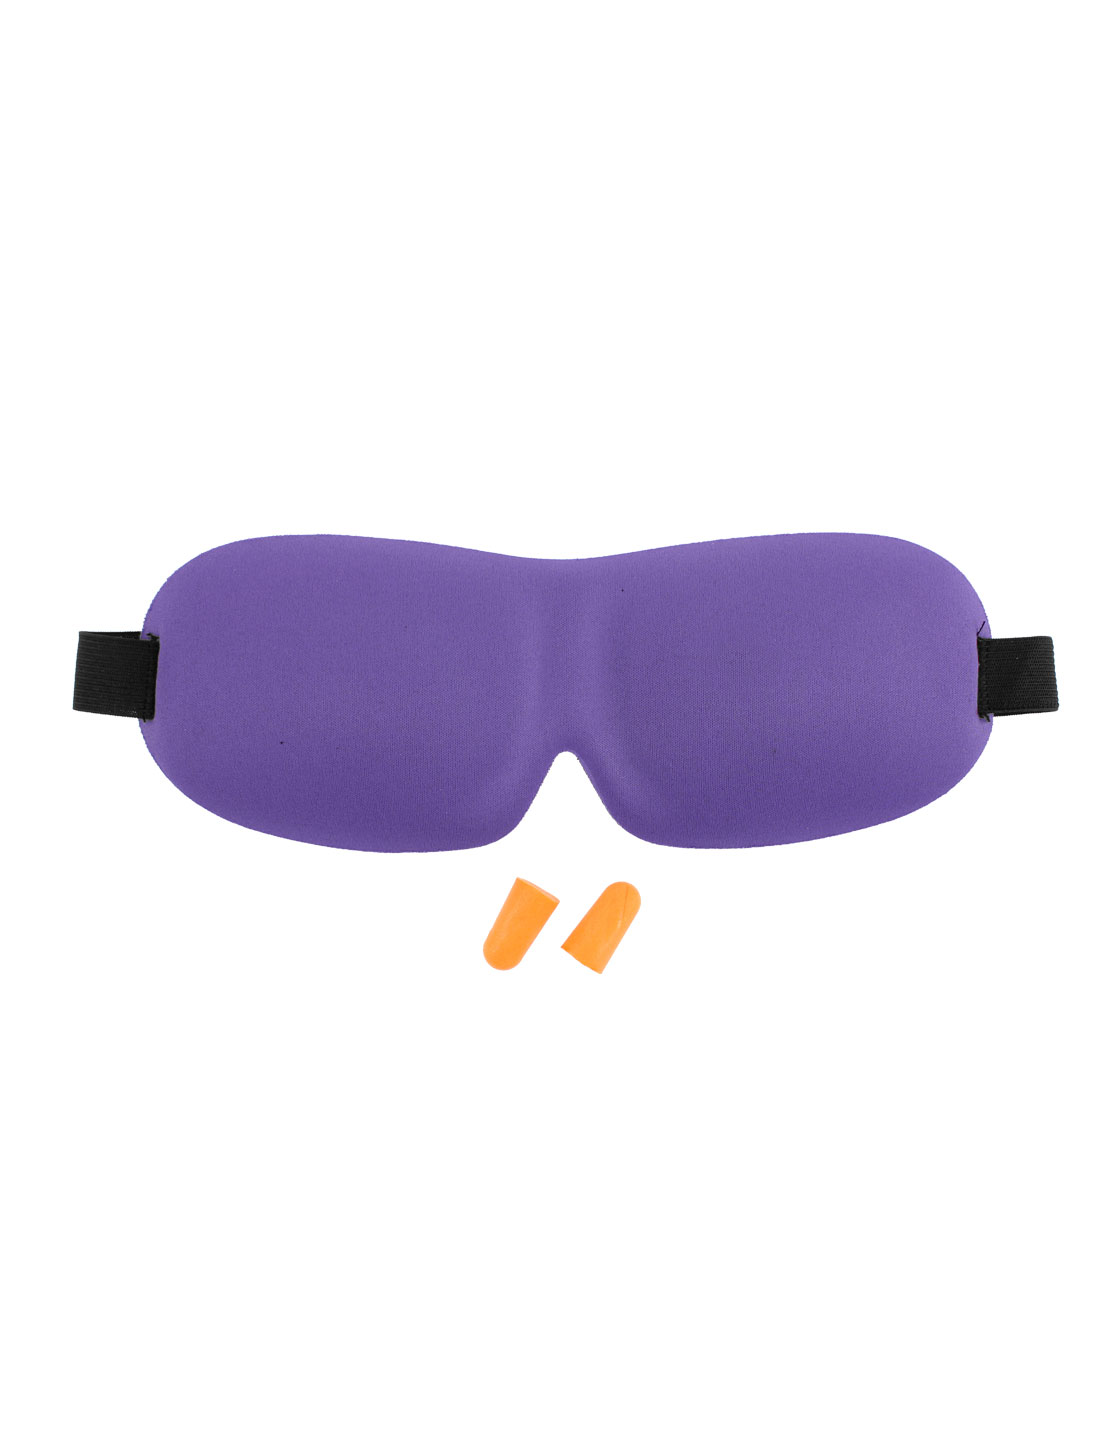 Travel Sleep Rest 3D Mask Eye Shade Sleeping Sponge Cover Blindfold Purple